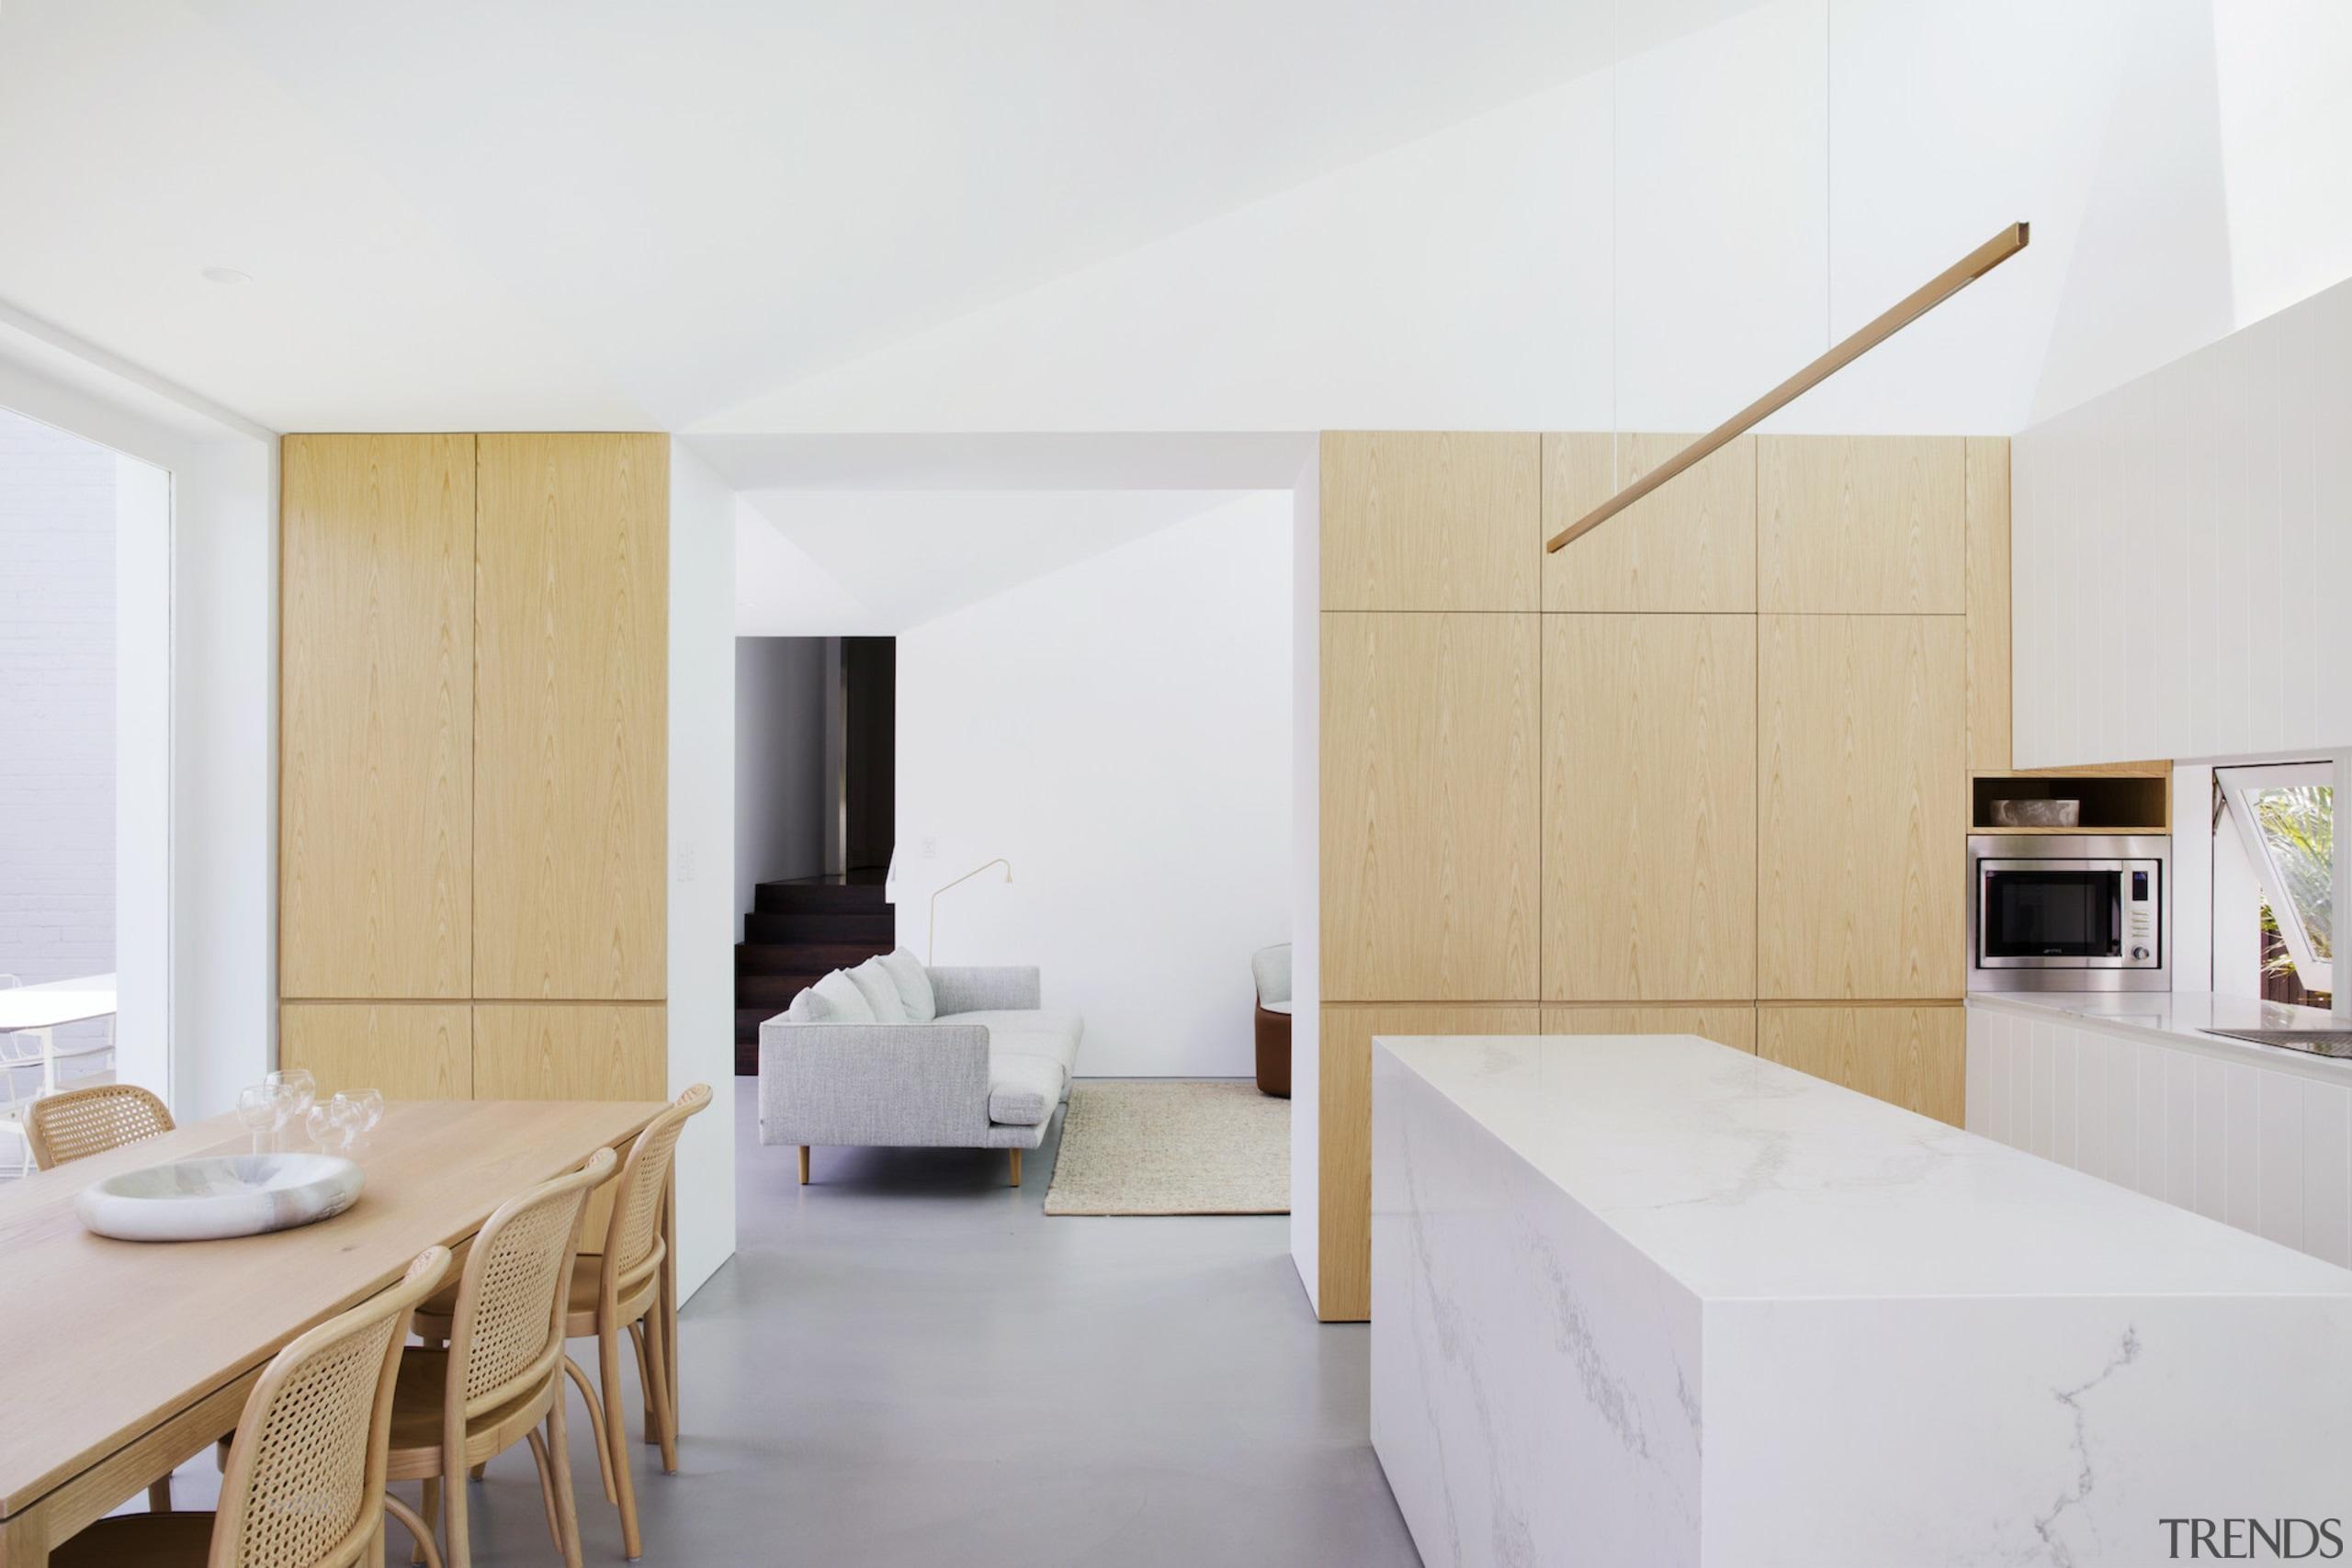 Architect Prineas architecture, floor, house, interior design, property, real estate, suite, white, gray